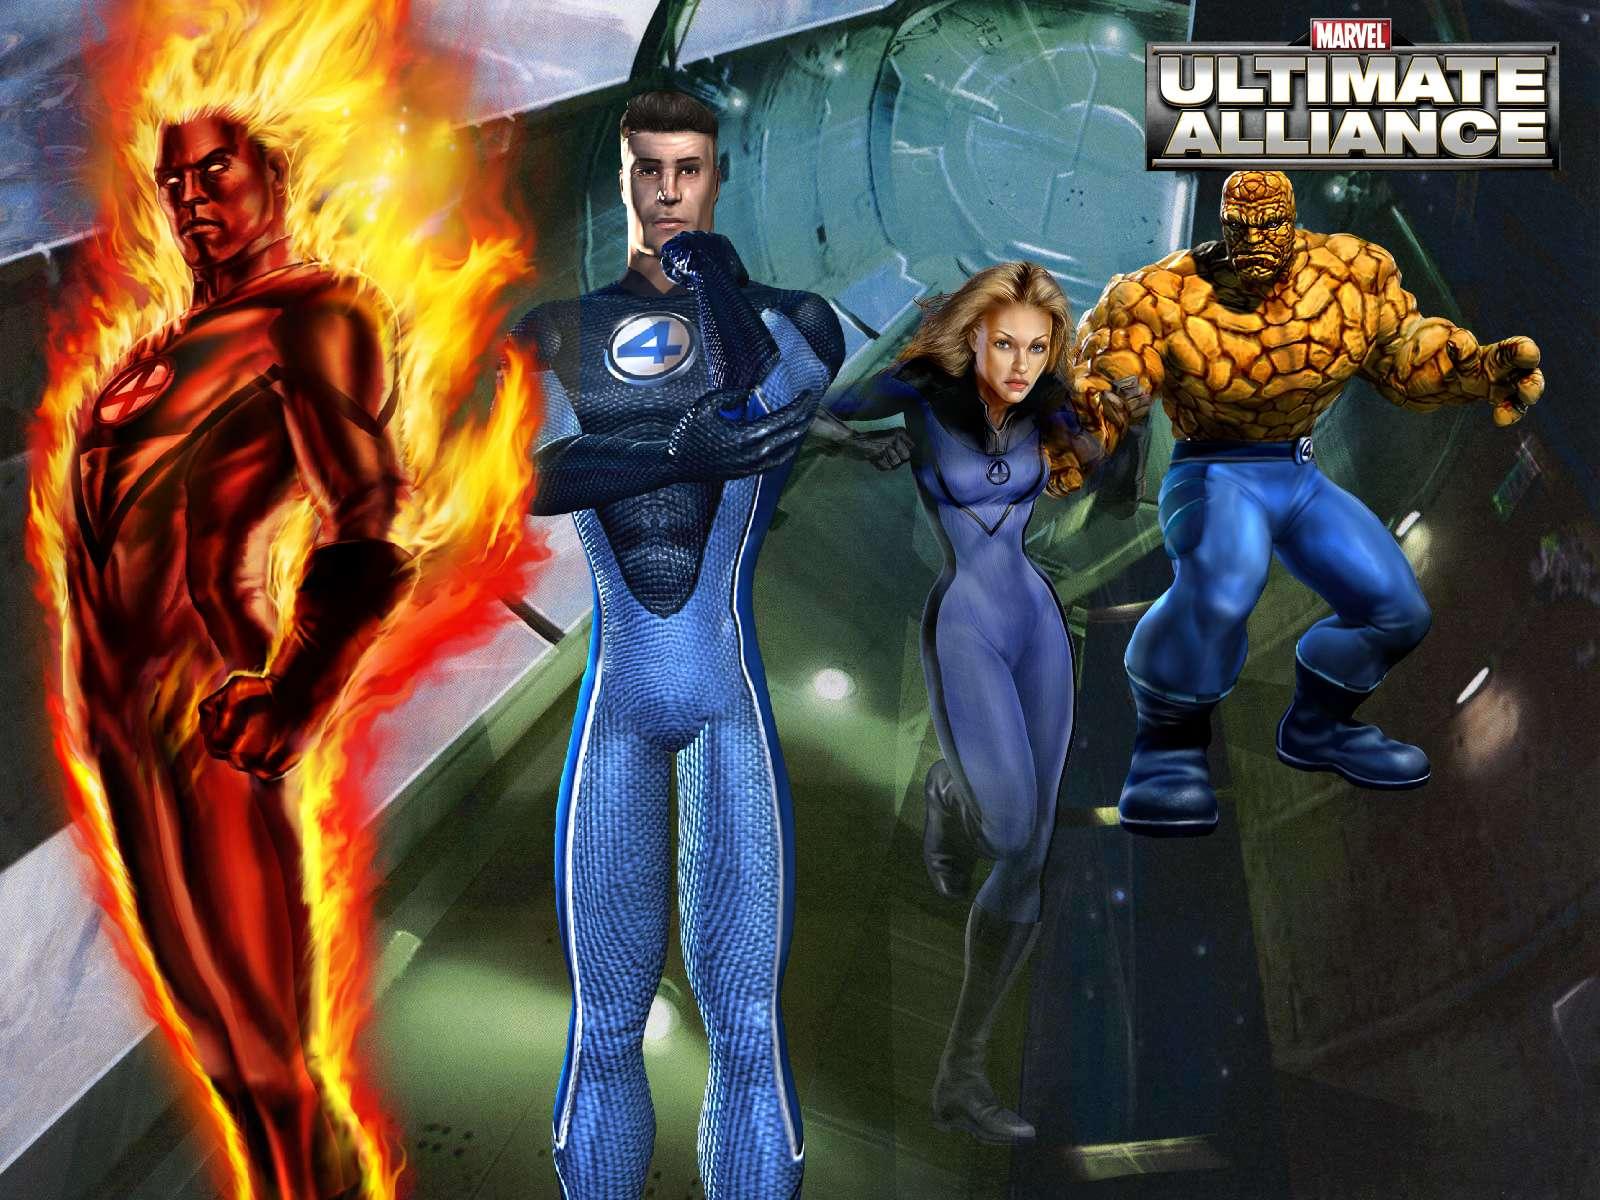 Marvel Ultimate Alliance Hulk Costumes & Sc 1 St Video Games